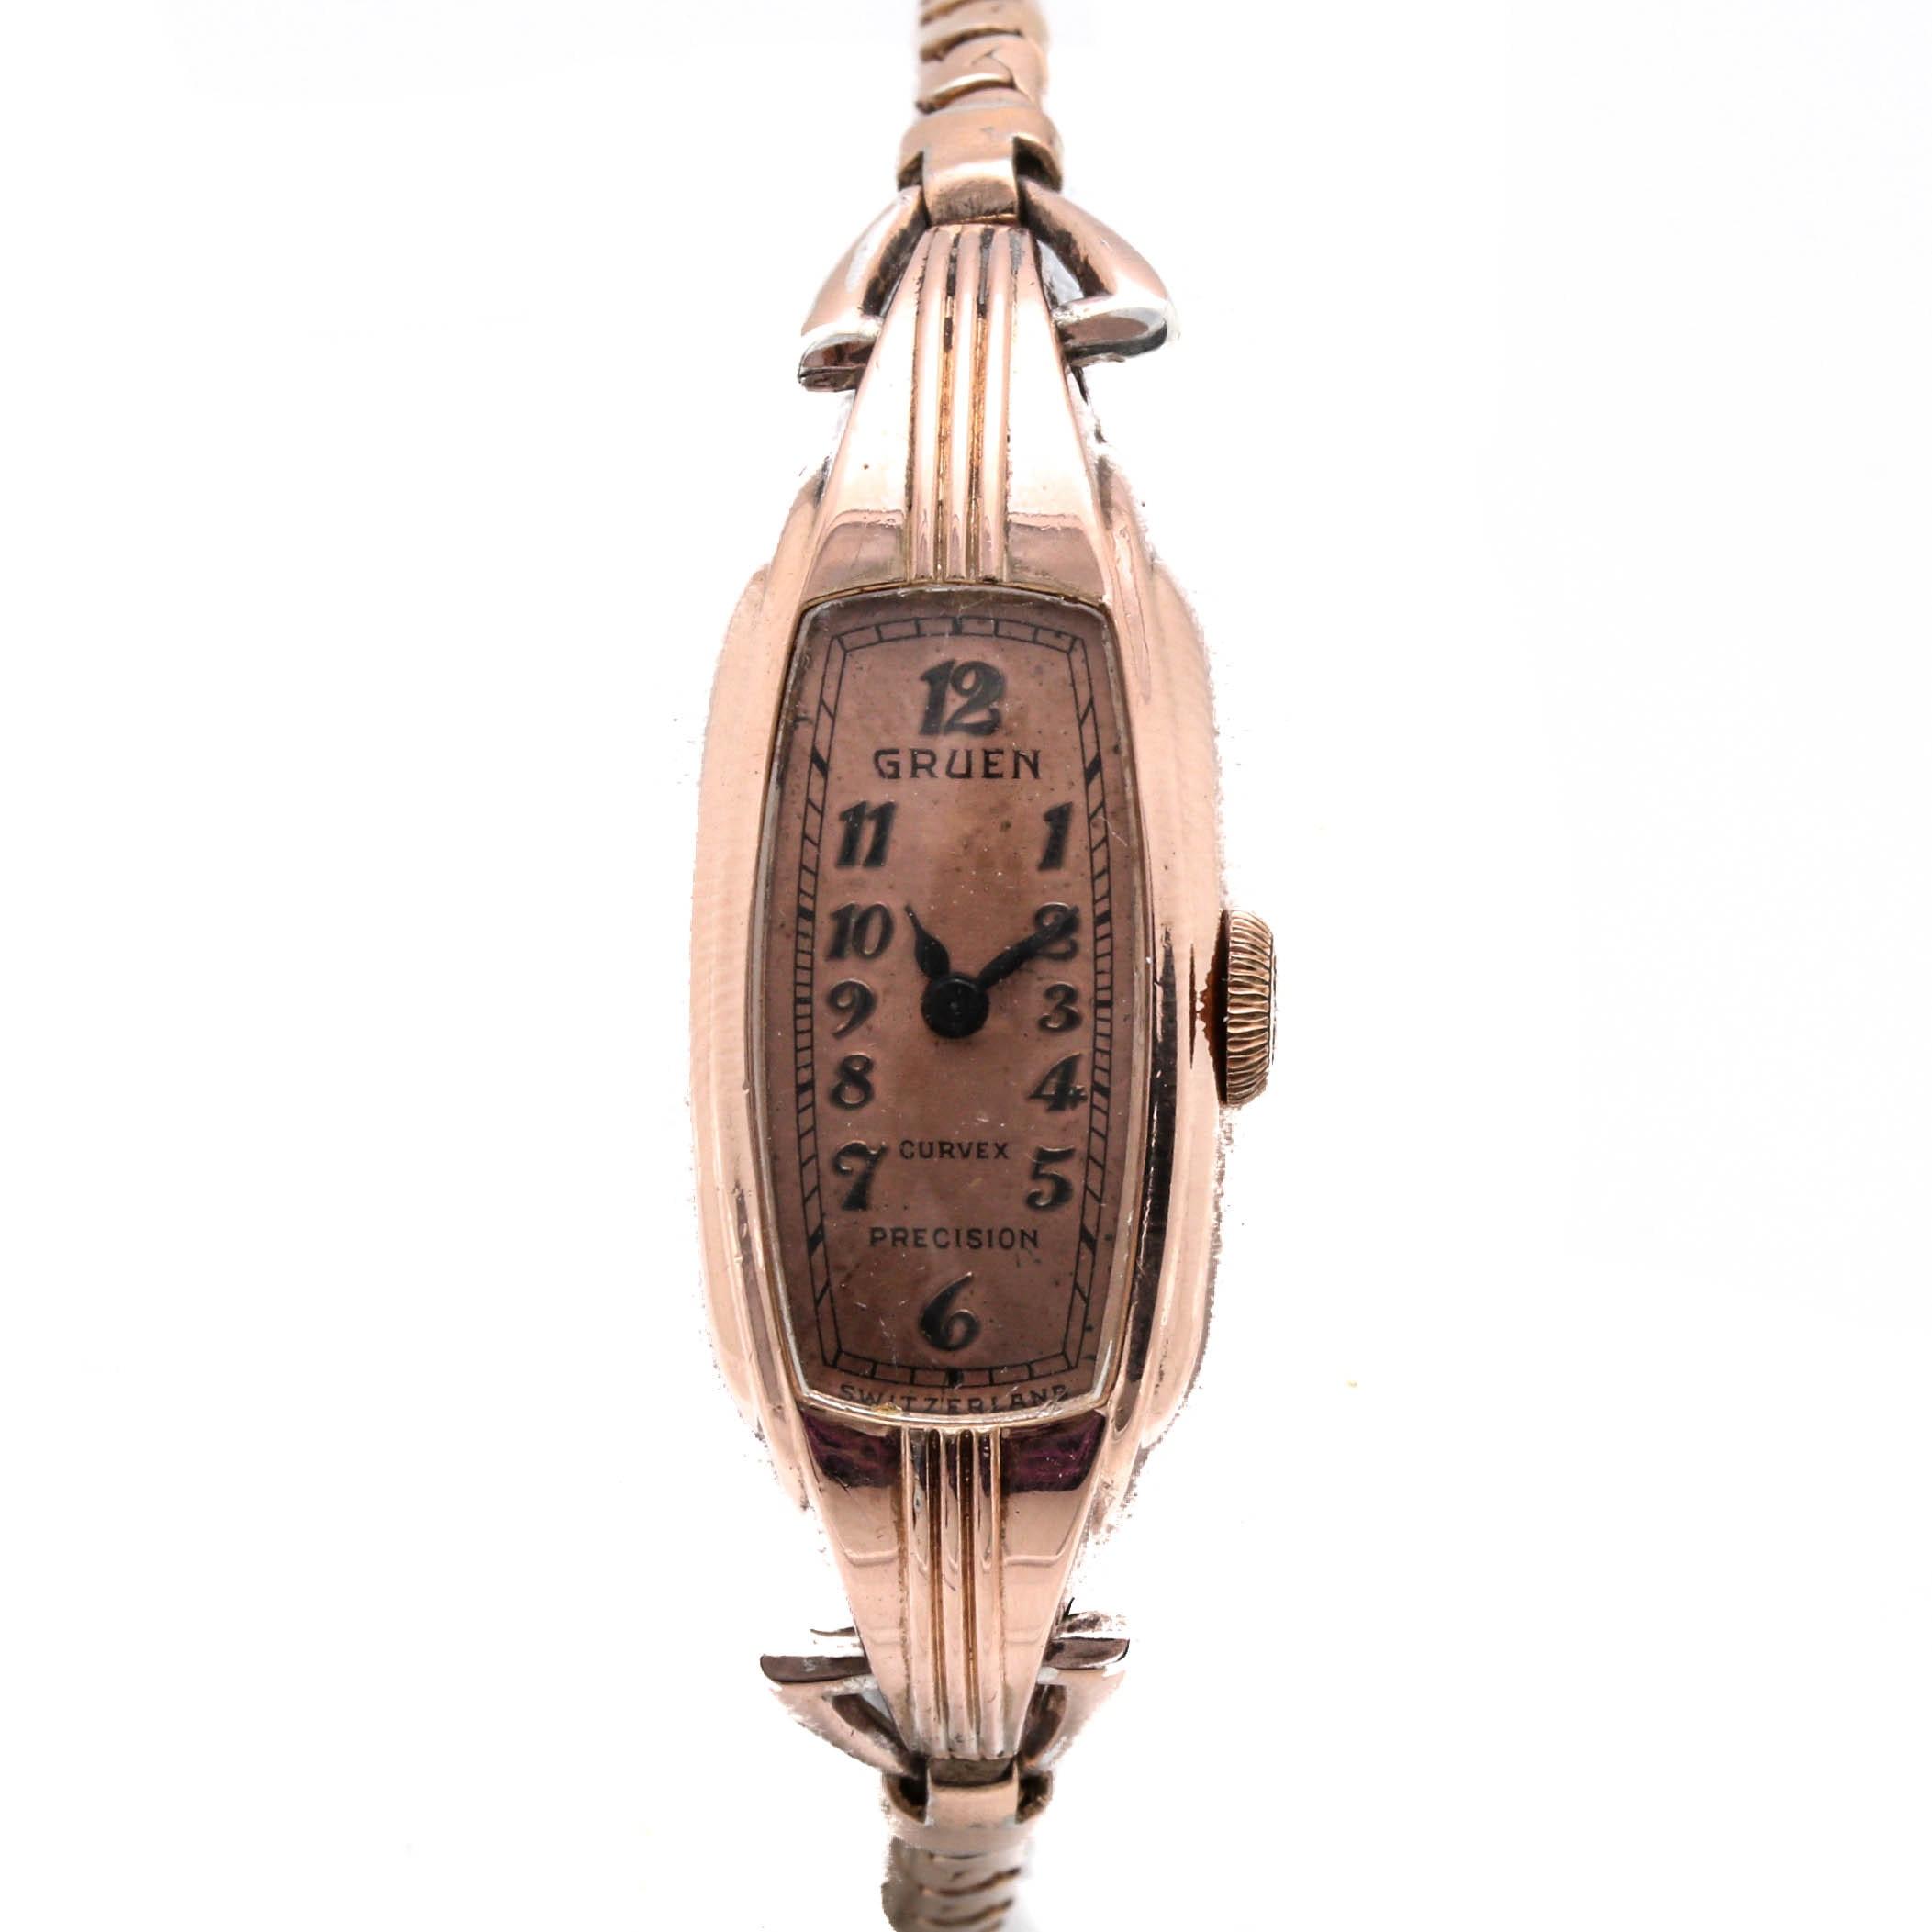 Gruen Curvex Gold Filled Wristwatch